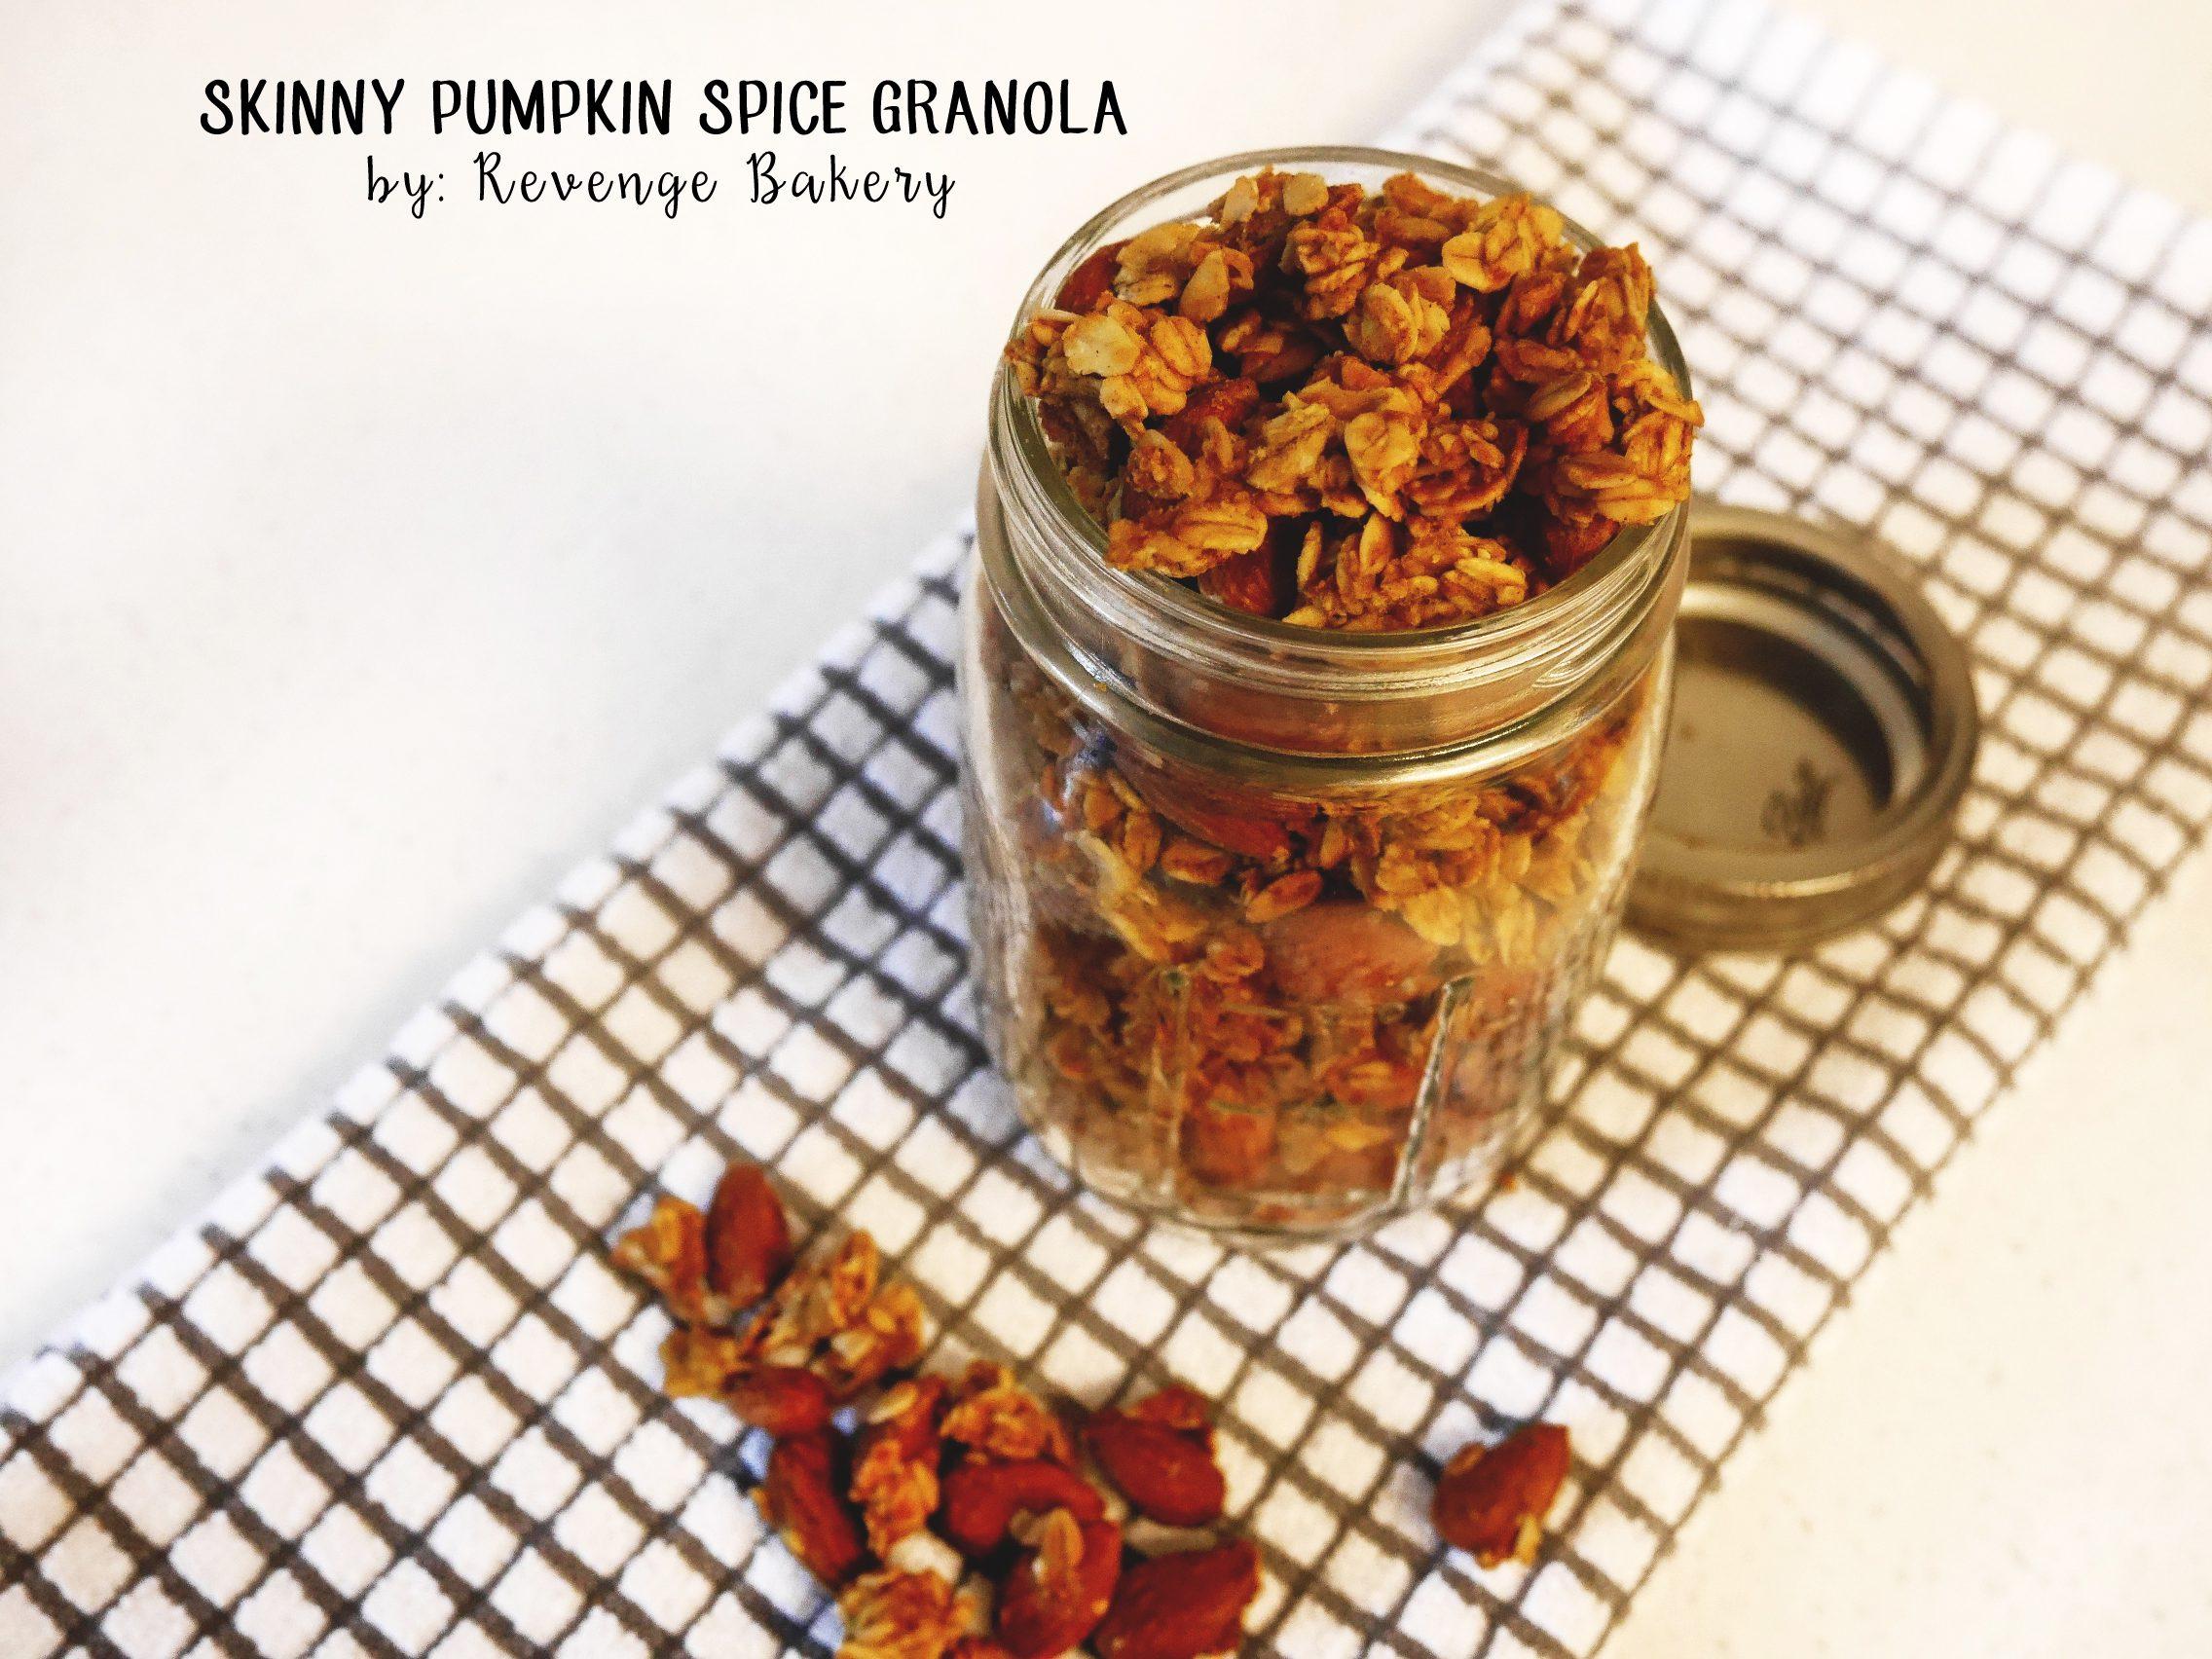 Mmm... Pumpkin Spice